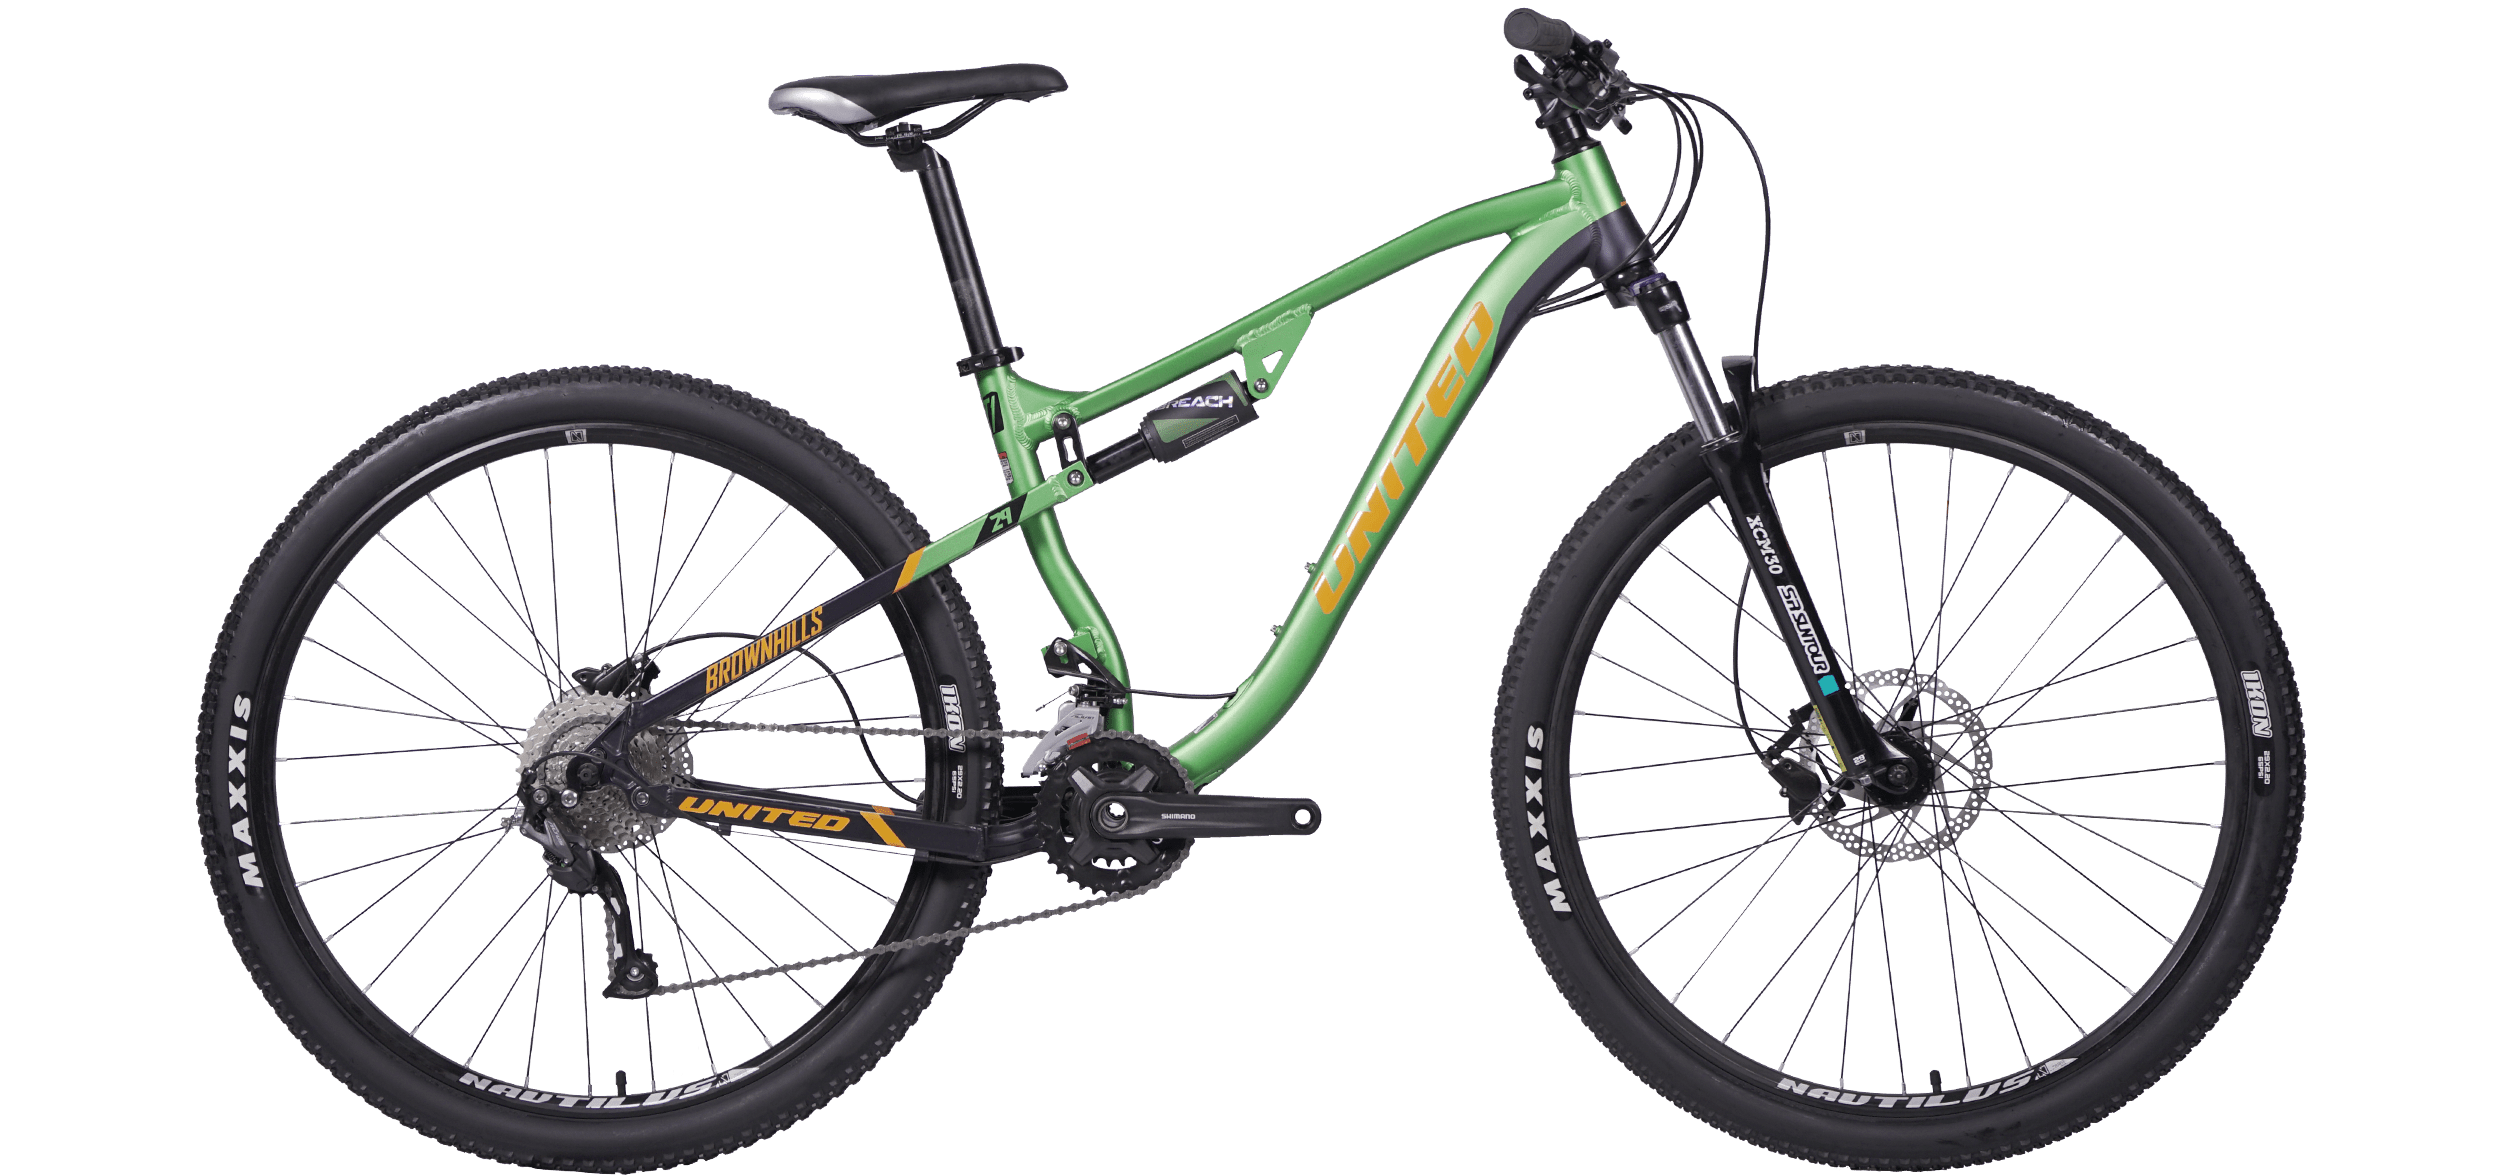 BROWNHILLS T1 :: Green-Black